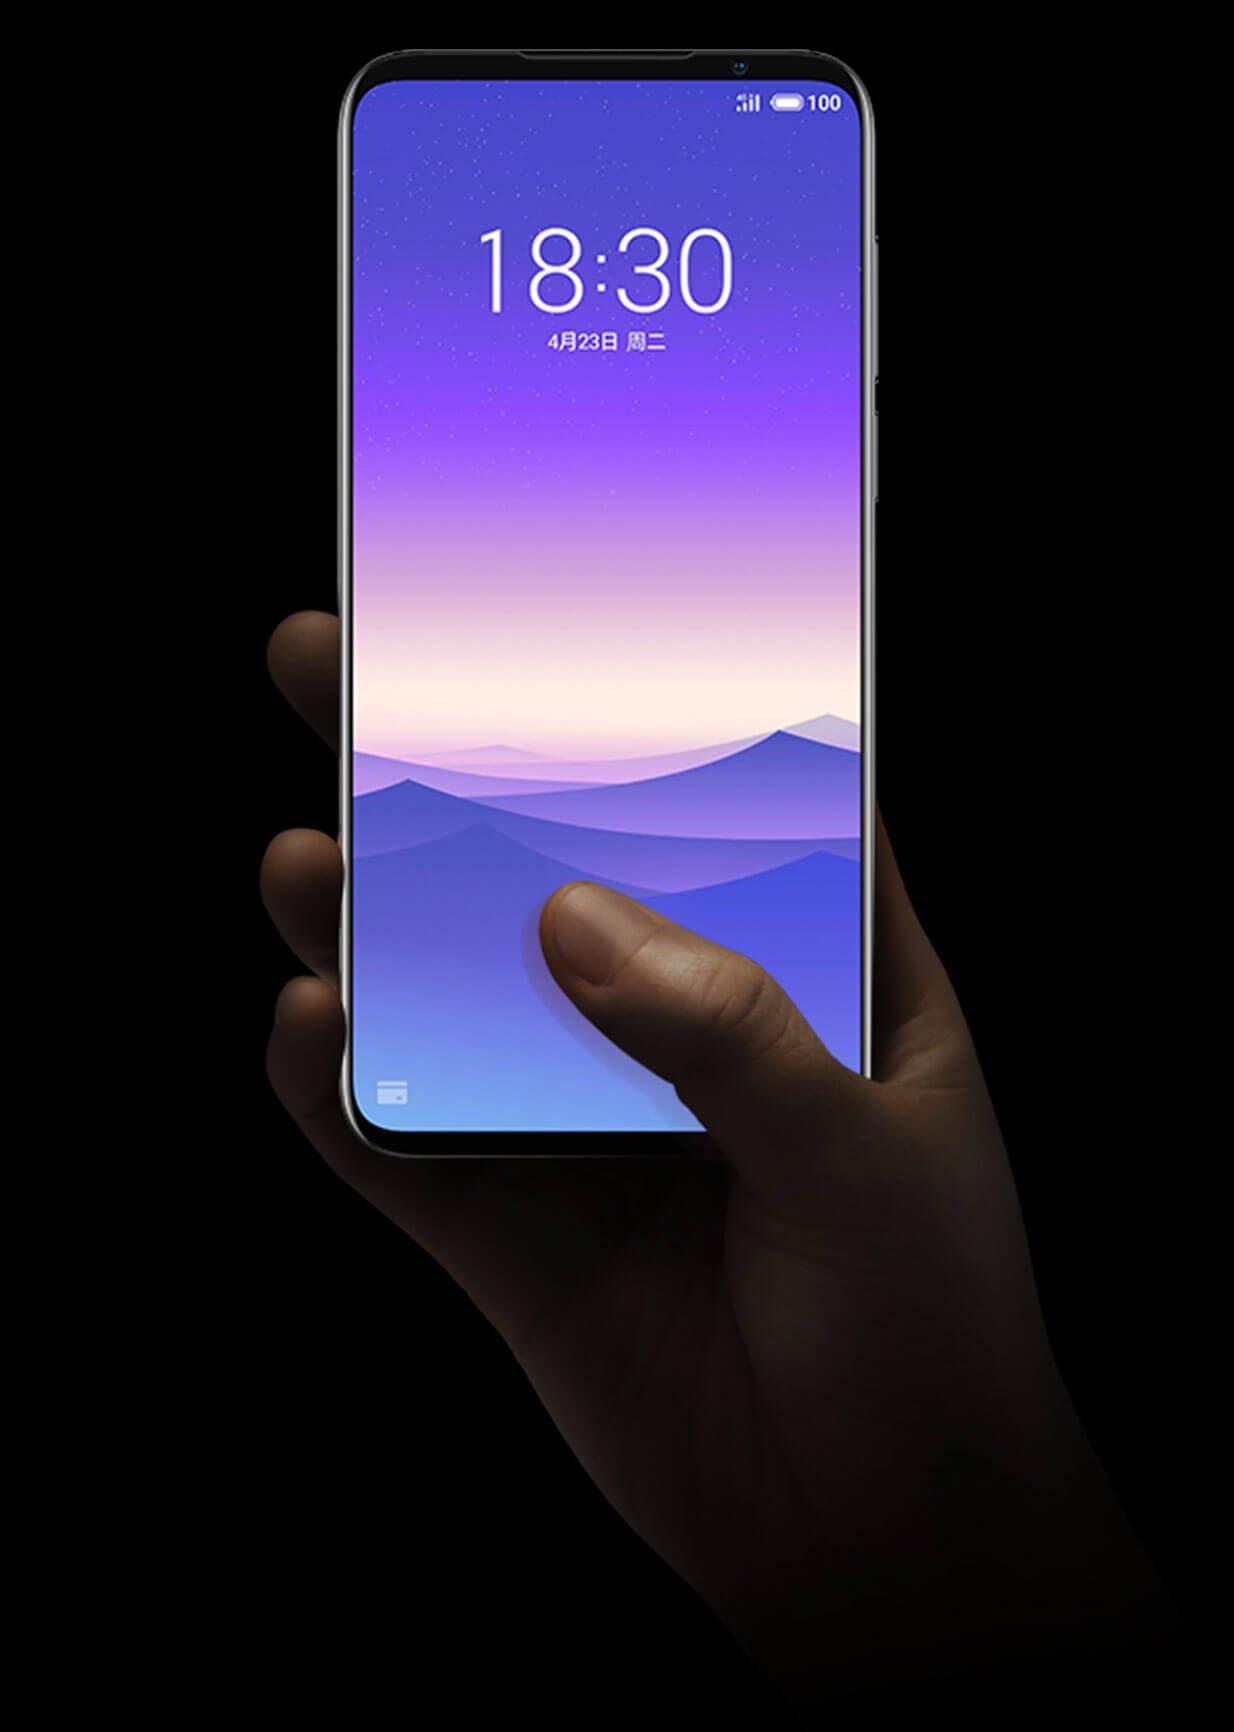 Meizu 16s fingerprint